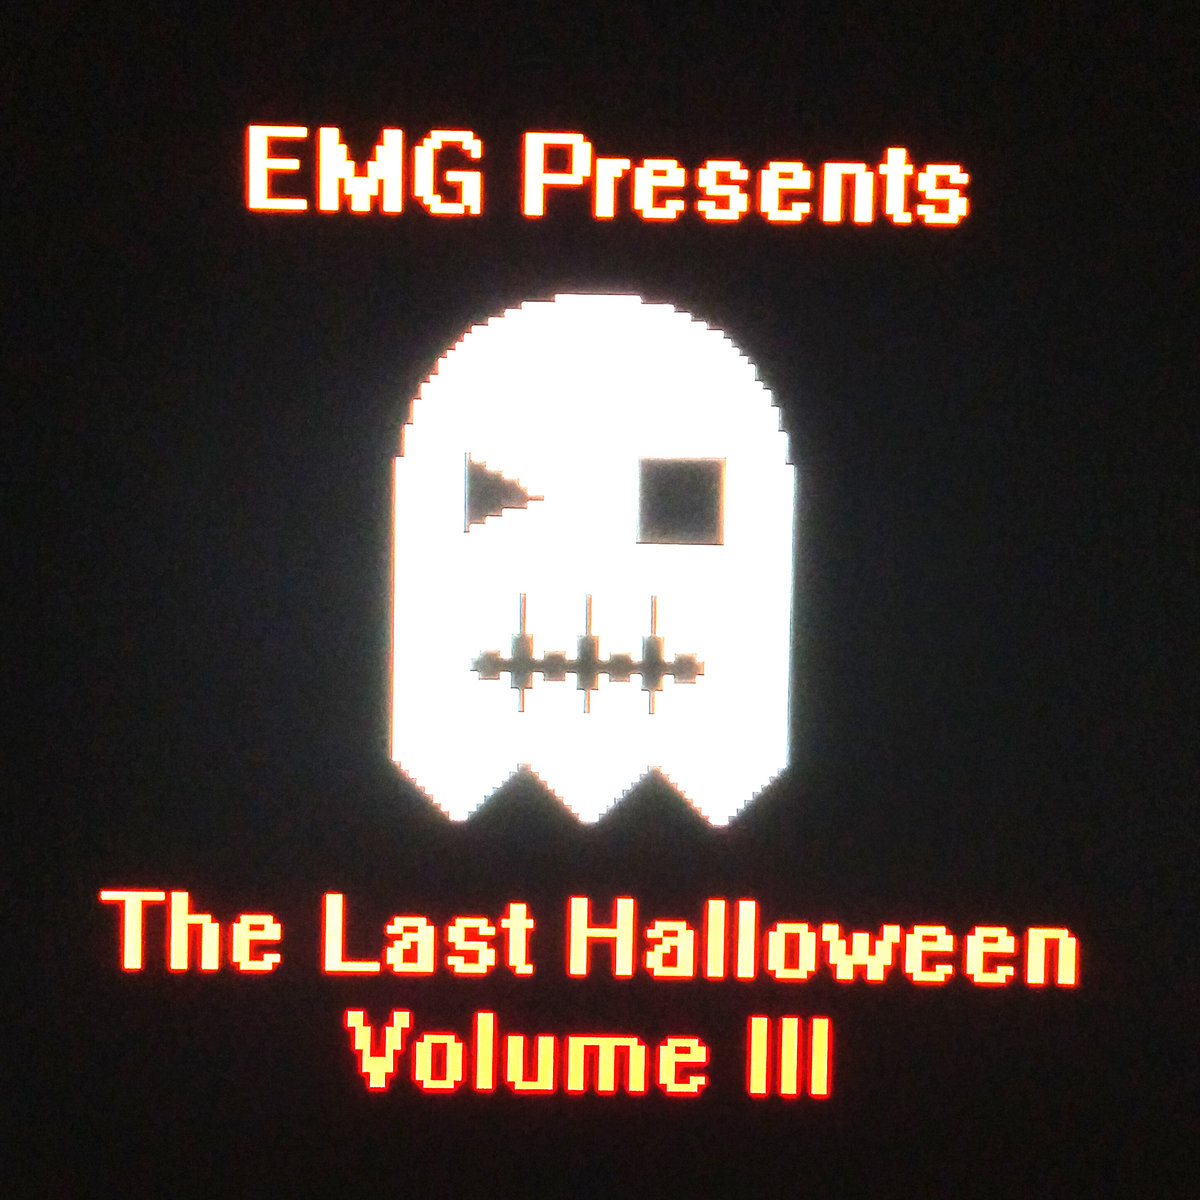 The Last Halloween Vol. III | Electronic Musicians Group